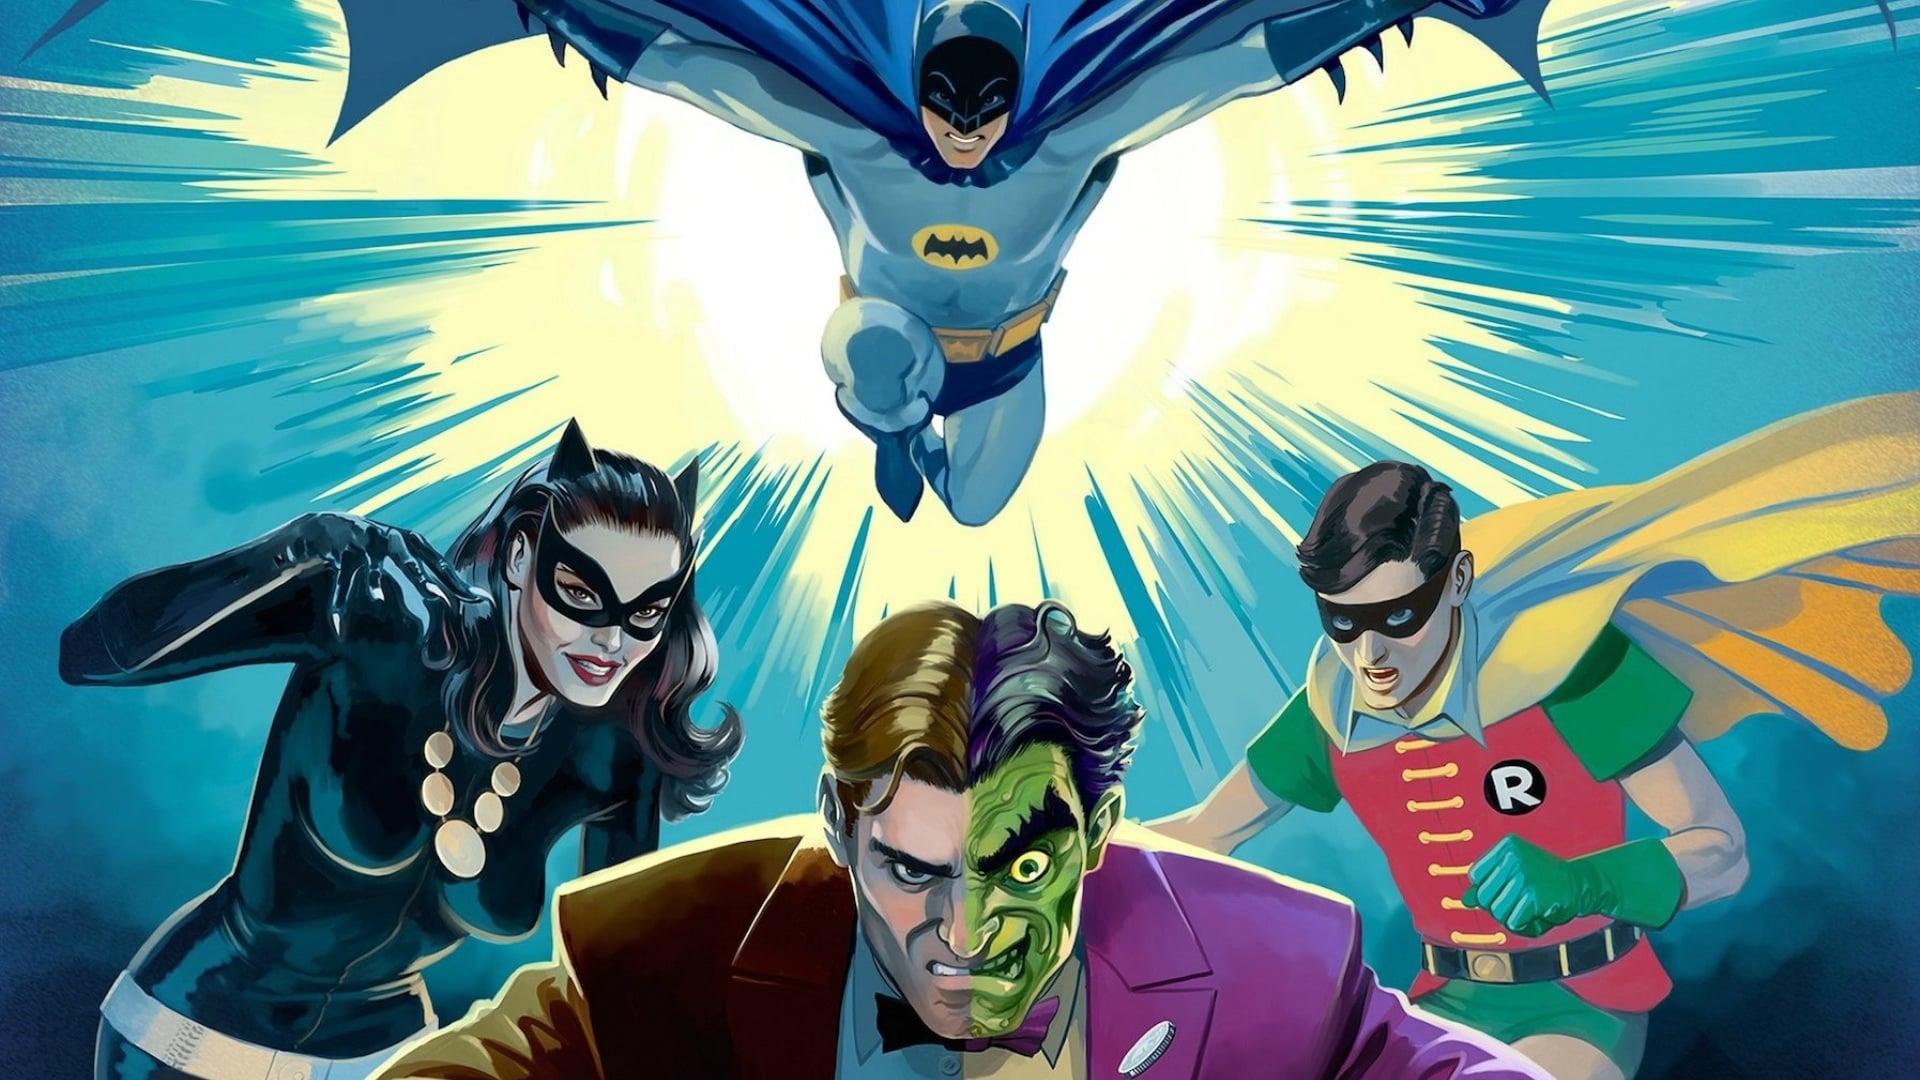 Batman vs Dos-Caras